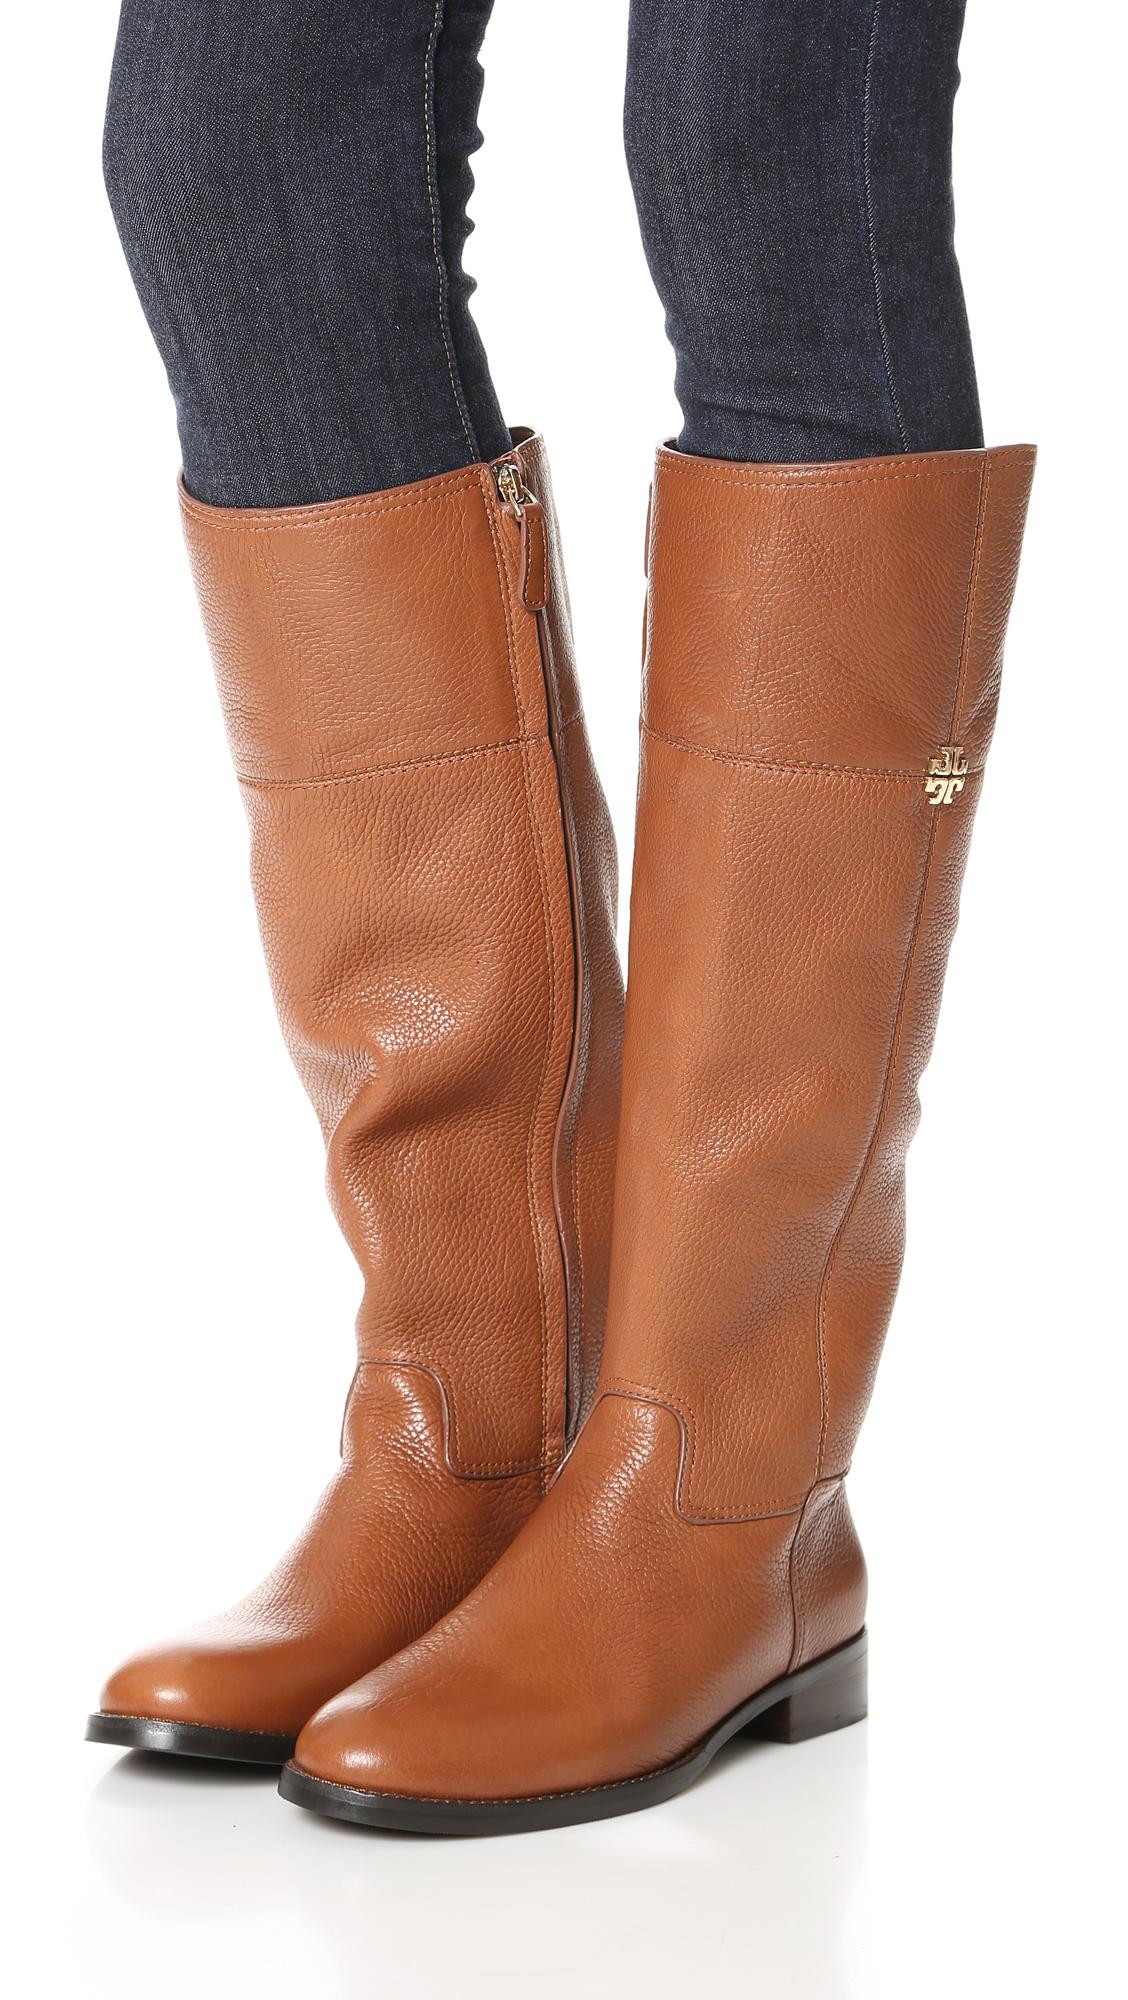 613783bcc0c Tory Burch Jolie Boots